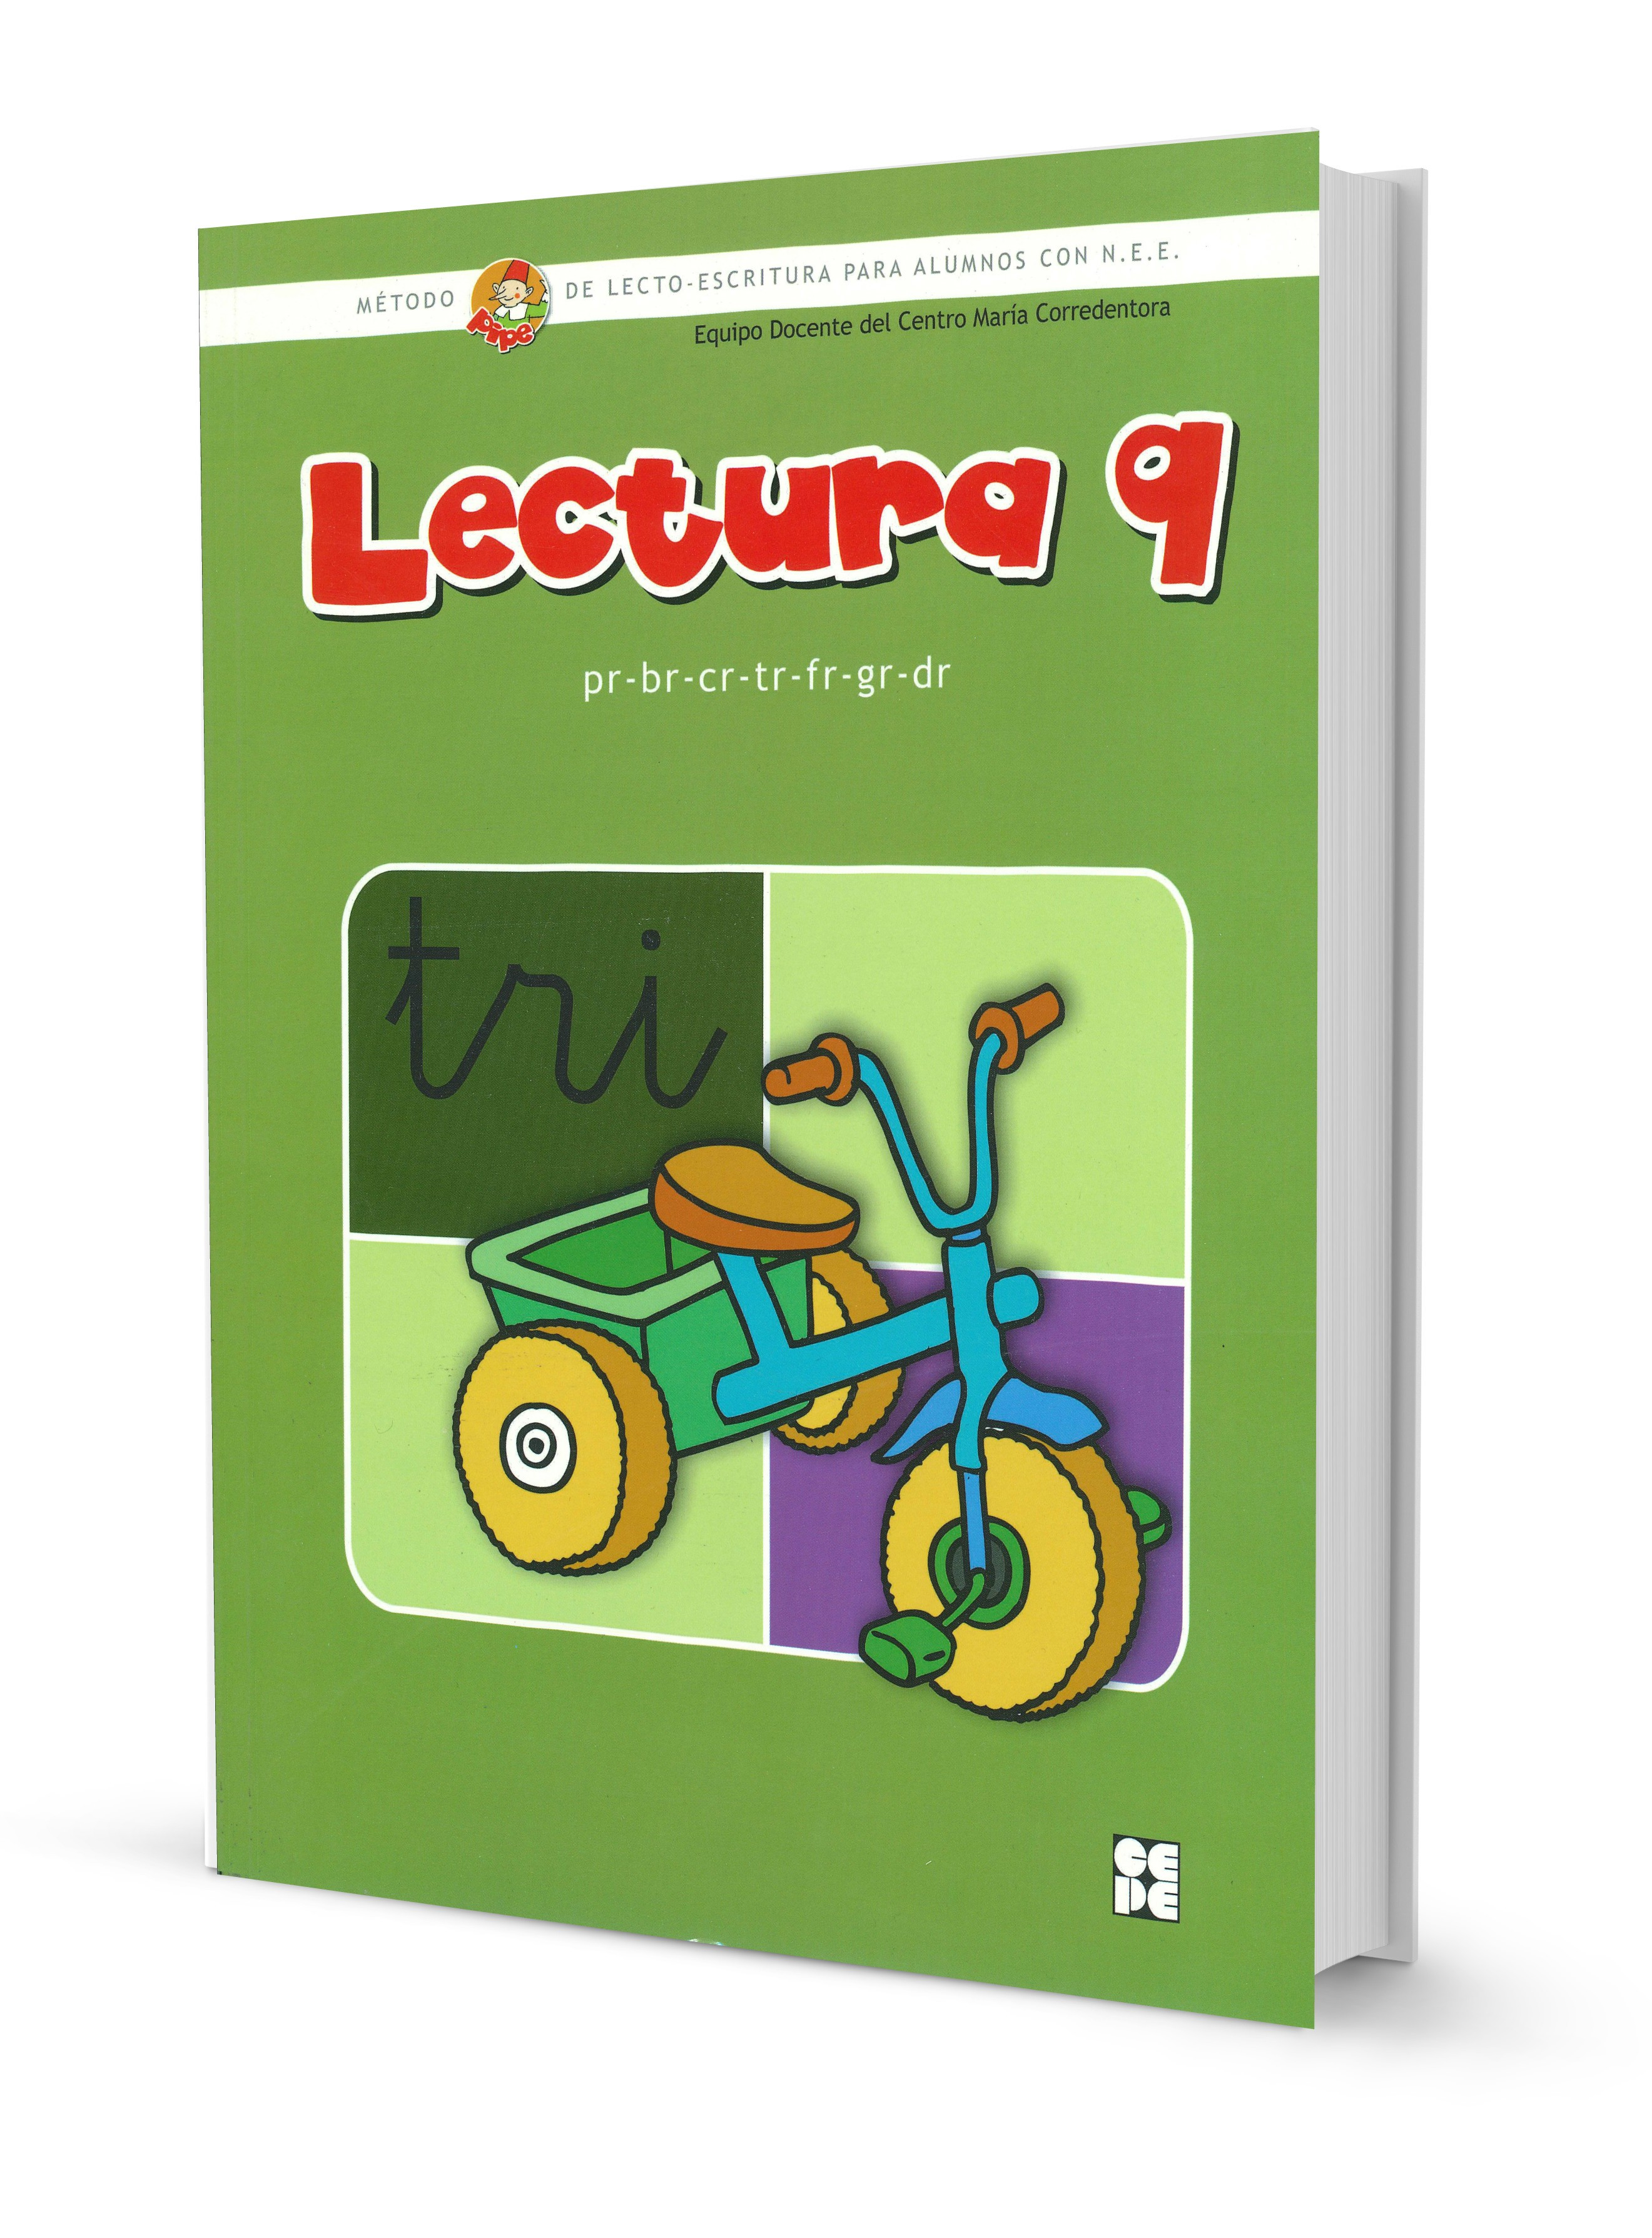 Método de lectura PIPE. Lectura 9